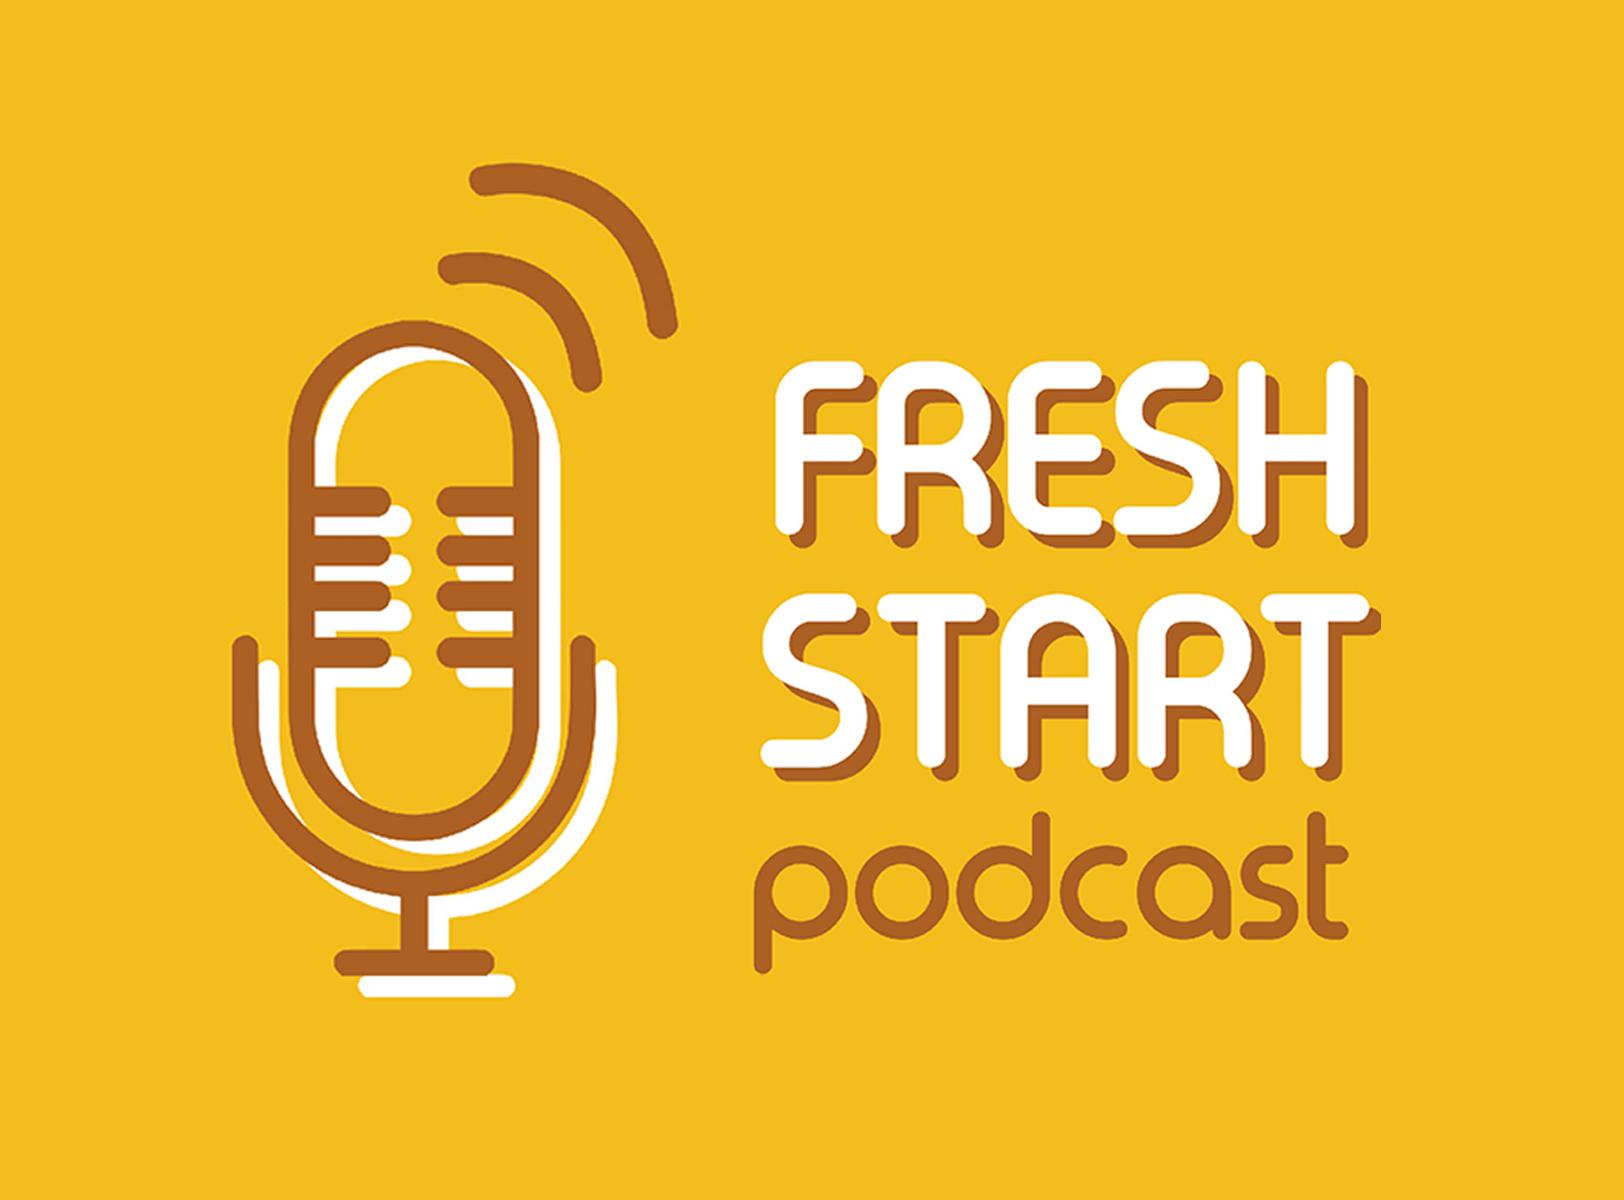 Fresh Start: Podcast News (4/17/2020 Fri.)